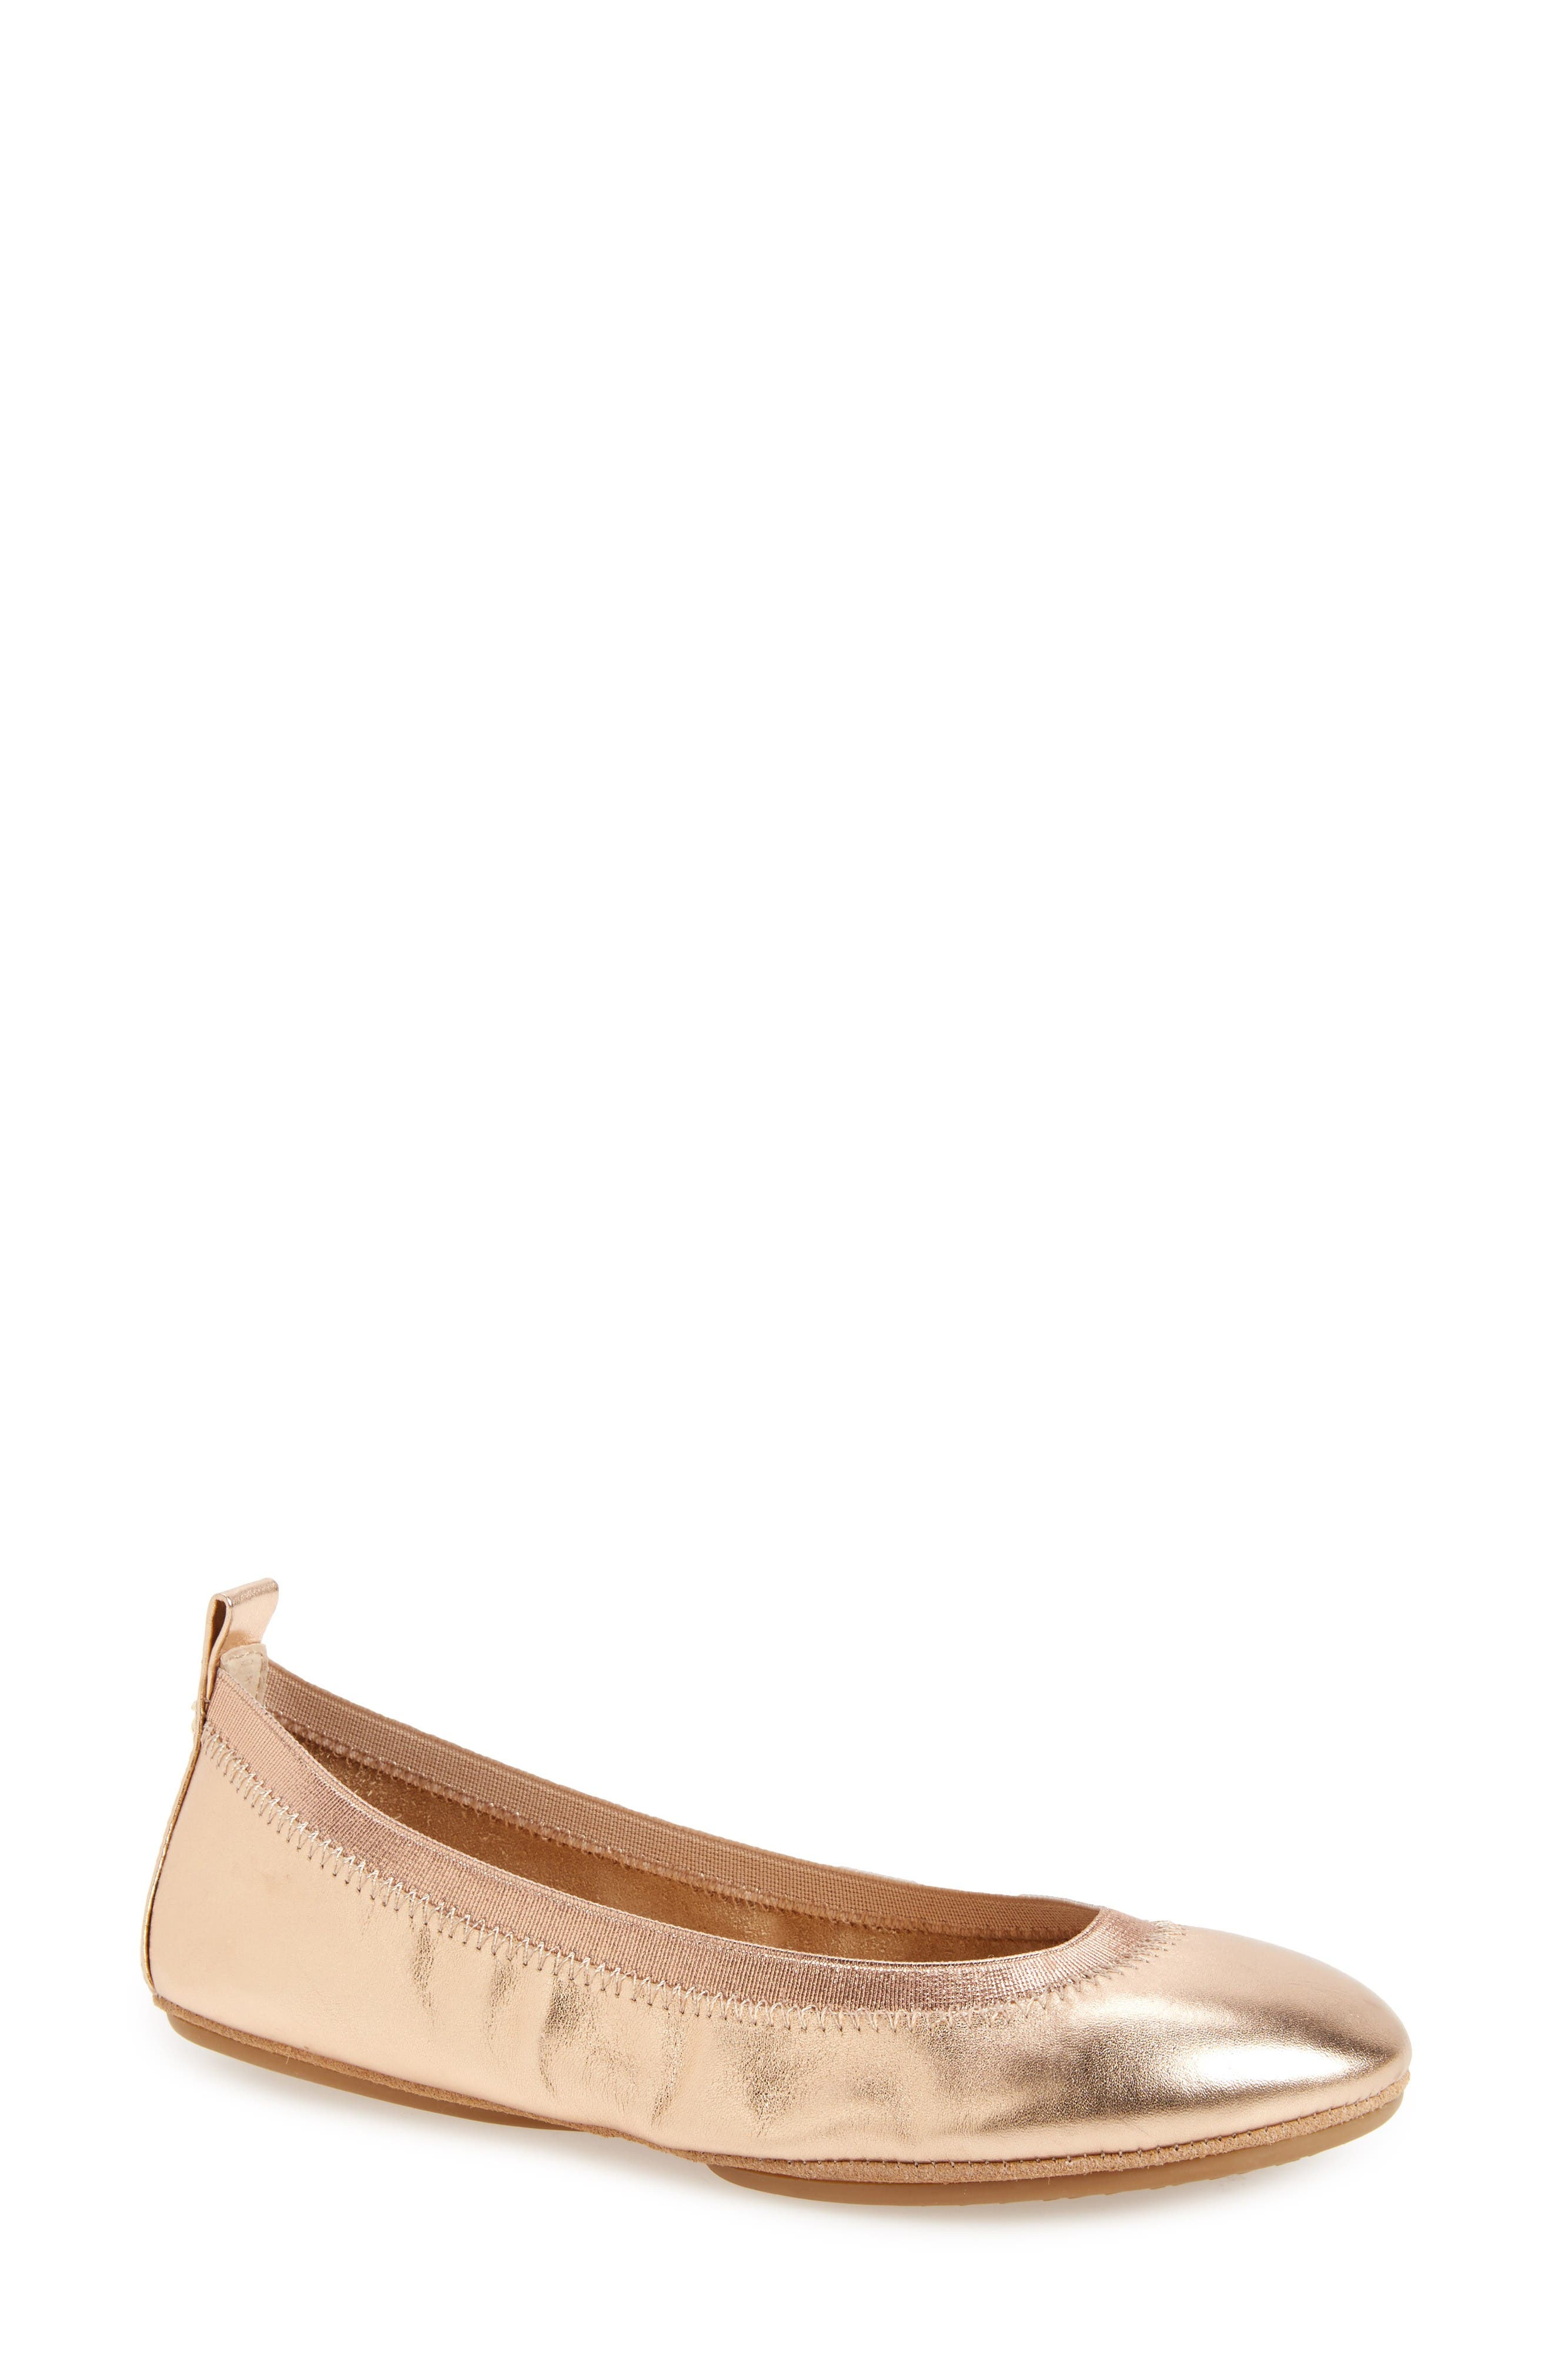 Samara 2.0 Foldable Ballet Flat,                         Main,                         color, Rose Gold Leather